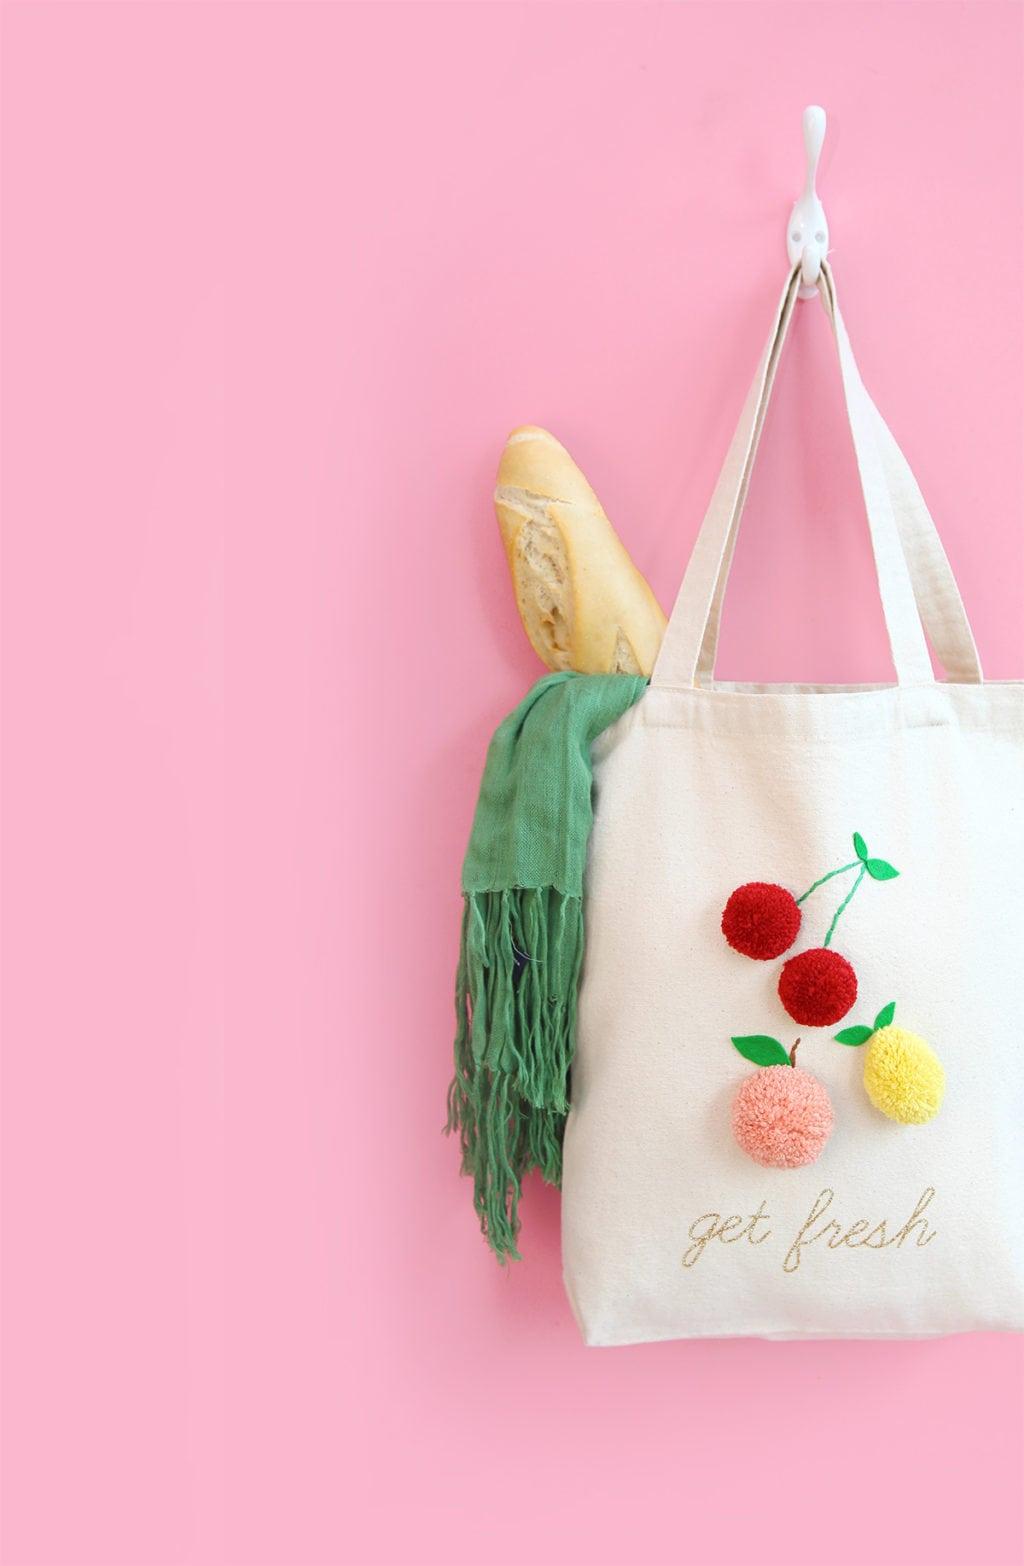 zéro déchet sac tissu diy blanc pompon rouge rose jaune cerise écharpe verte - blog déco - clem around the corner